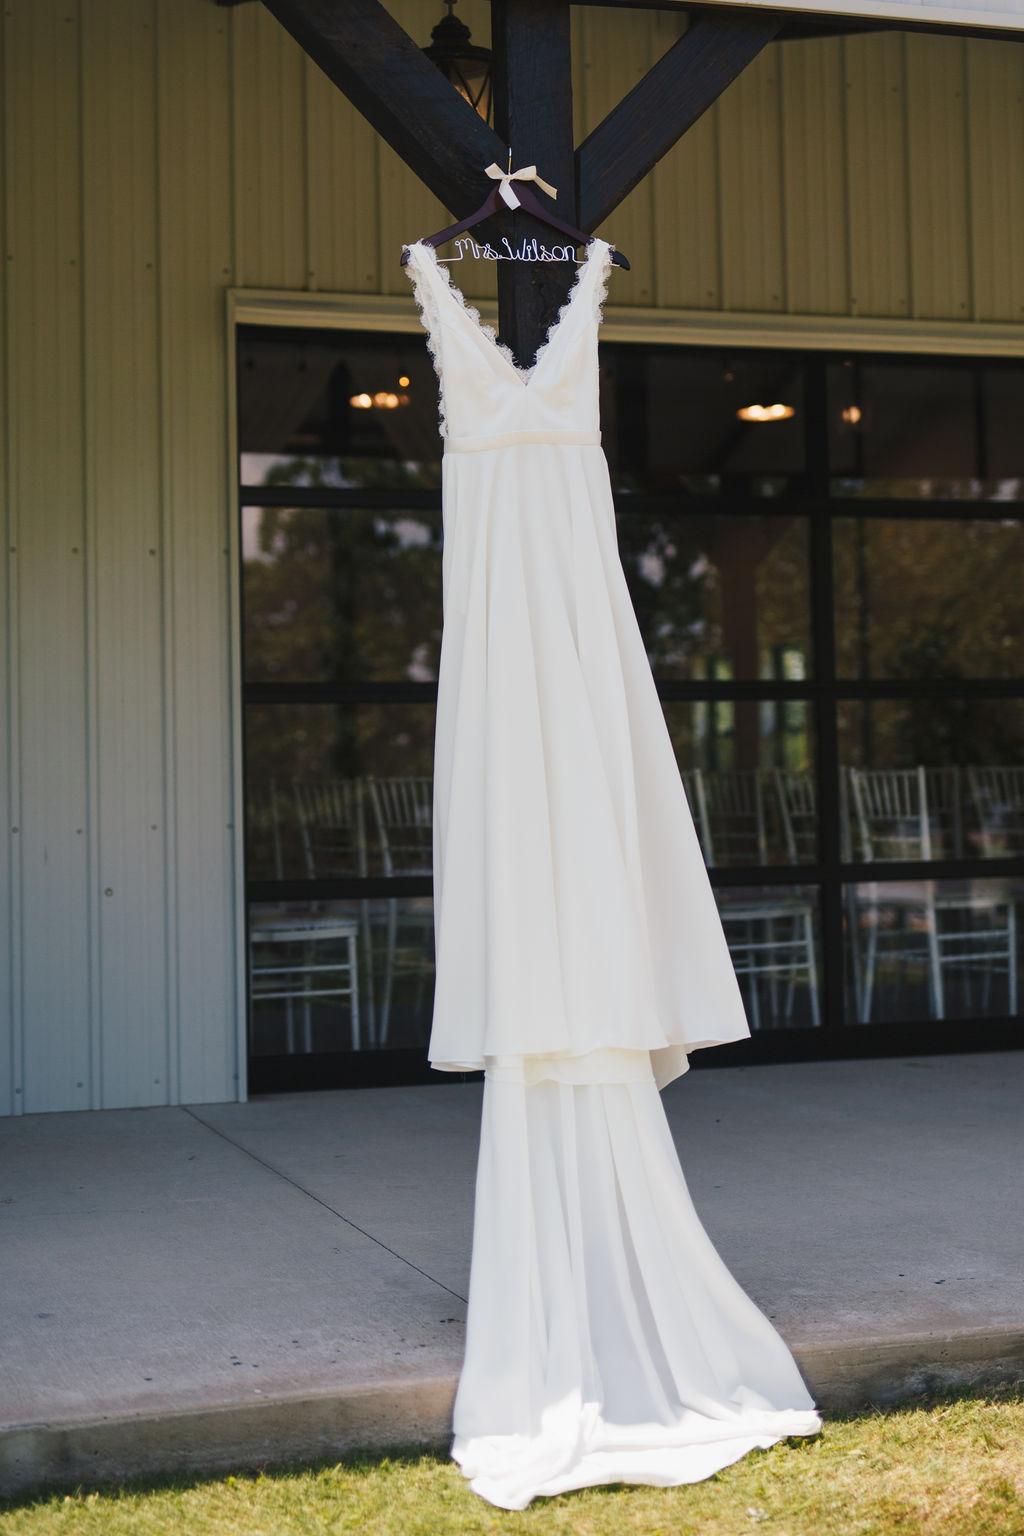 Bixby White Barn Tulsa Wedding 6.jpg